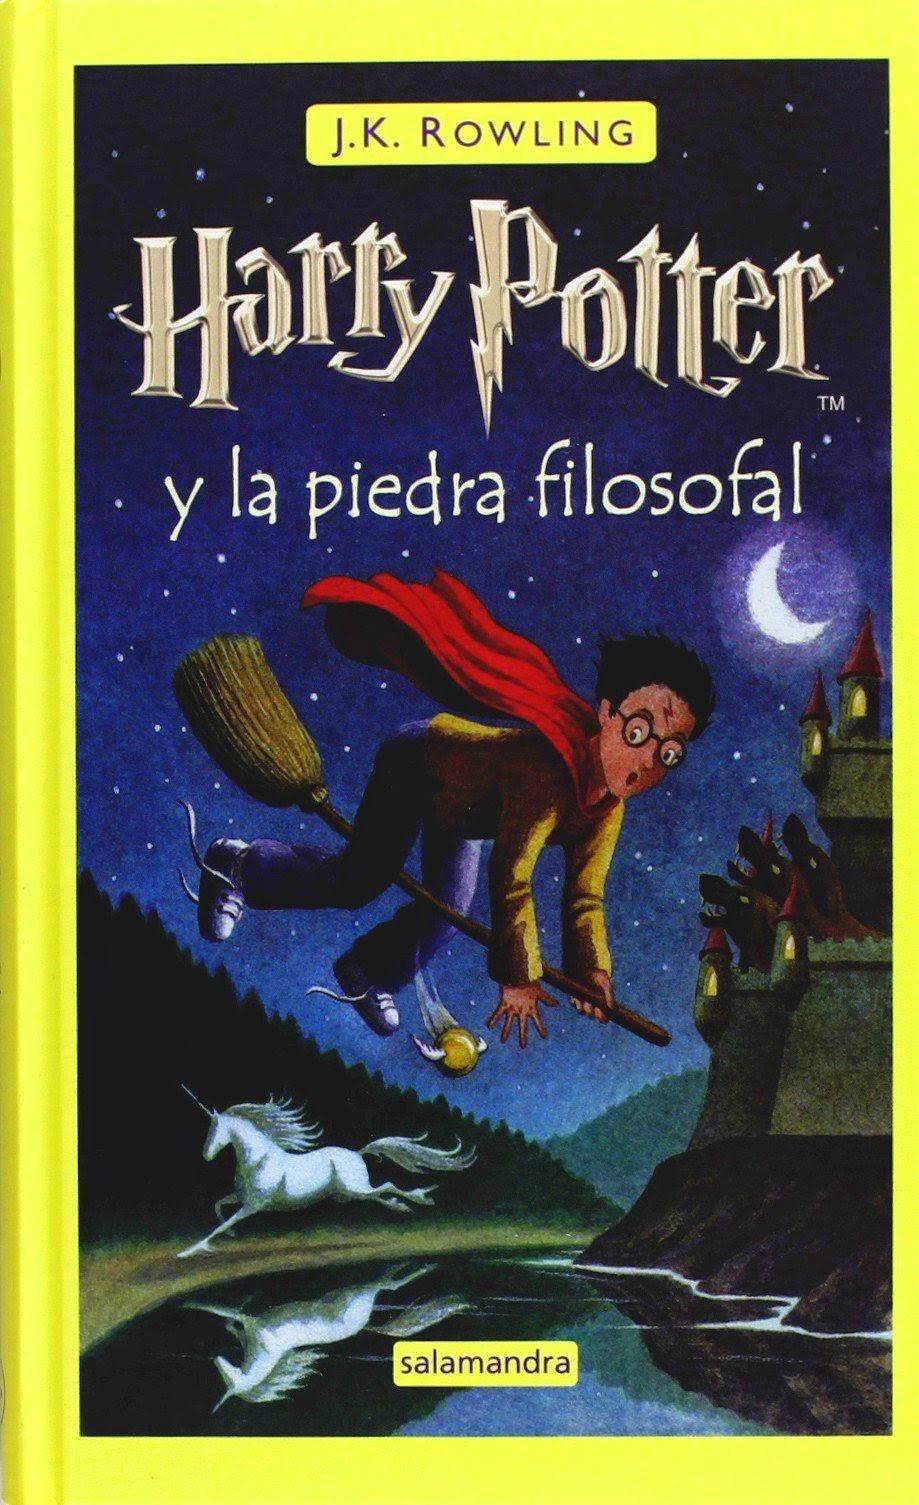 """Harry Potter y la piedra filosofal"" - J.K. Rowling"